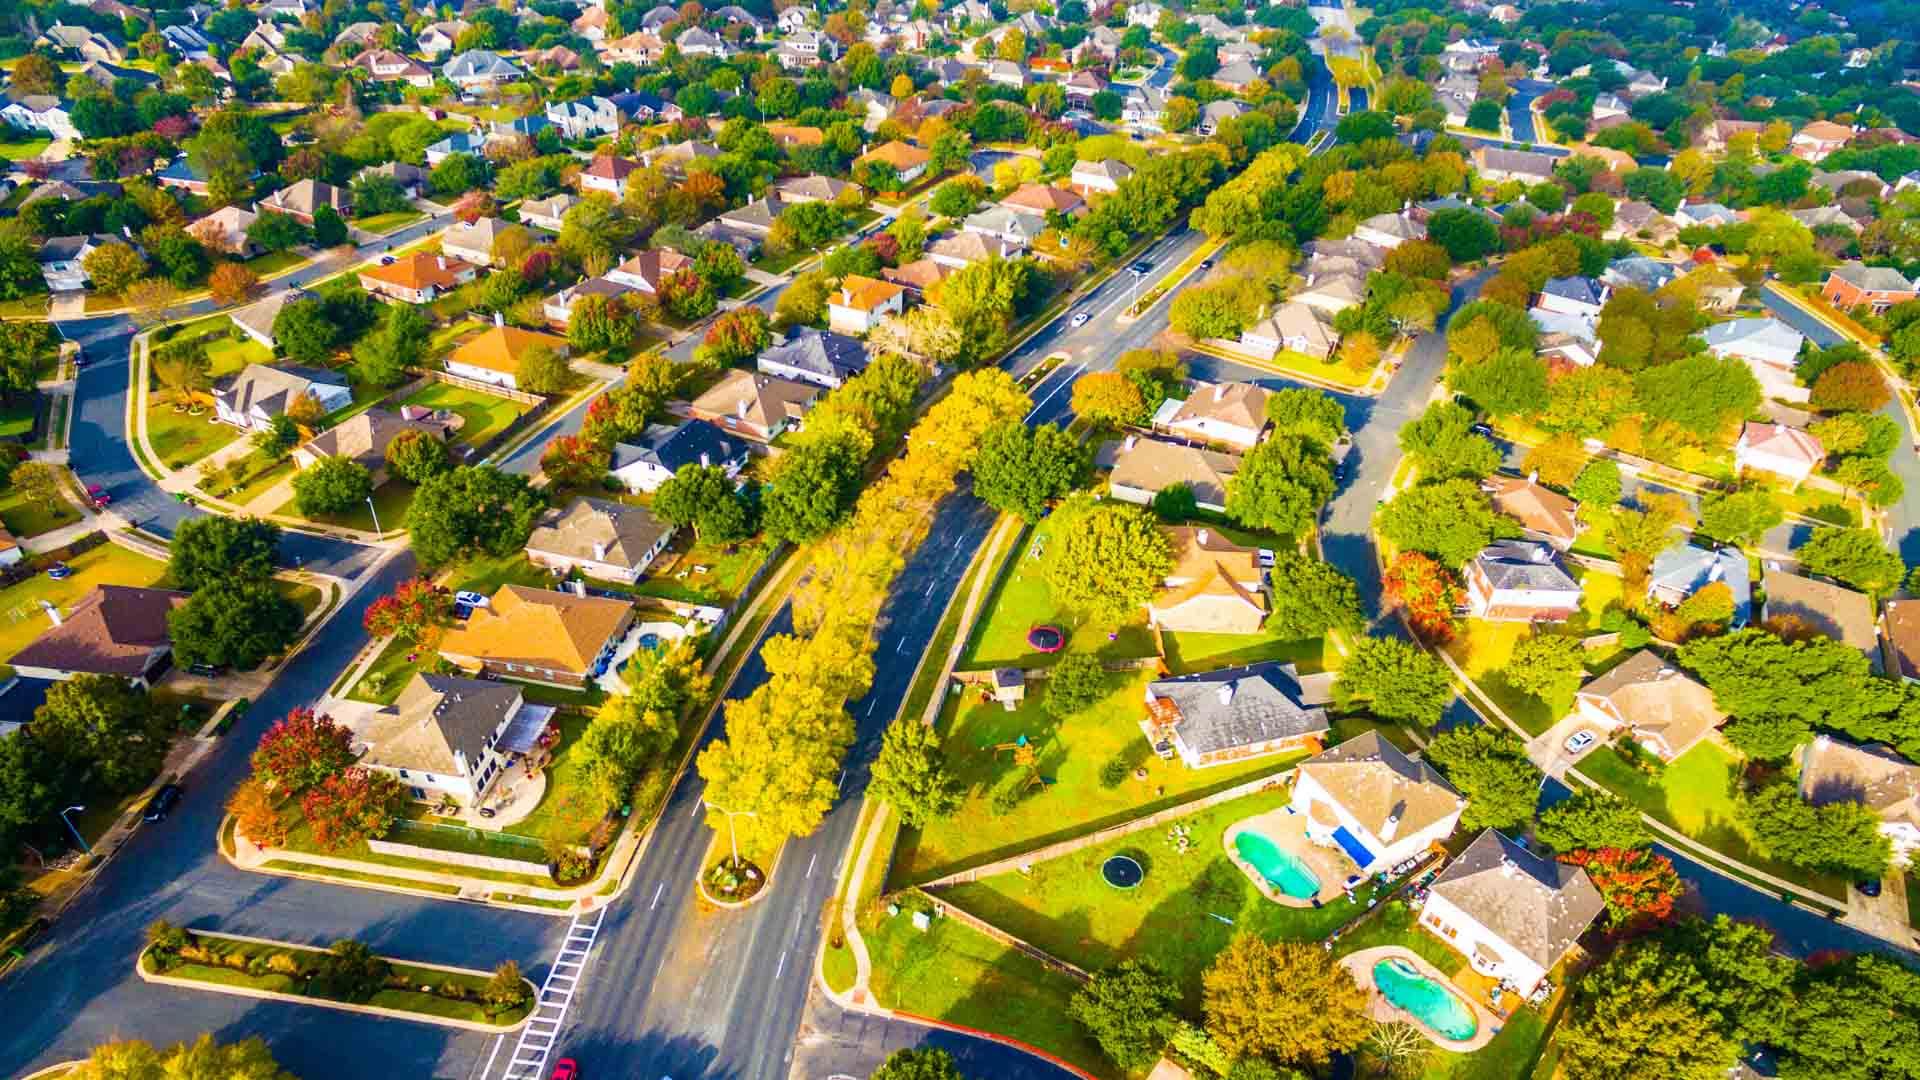 Austin Neighborhood Videos   Video Tours of Top Austin Neighborhoods